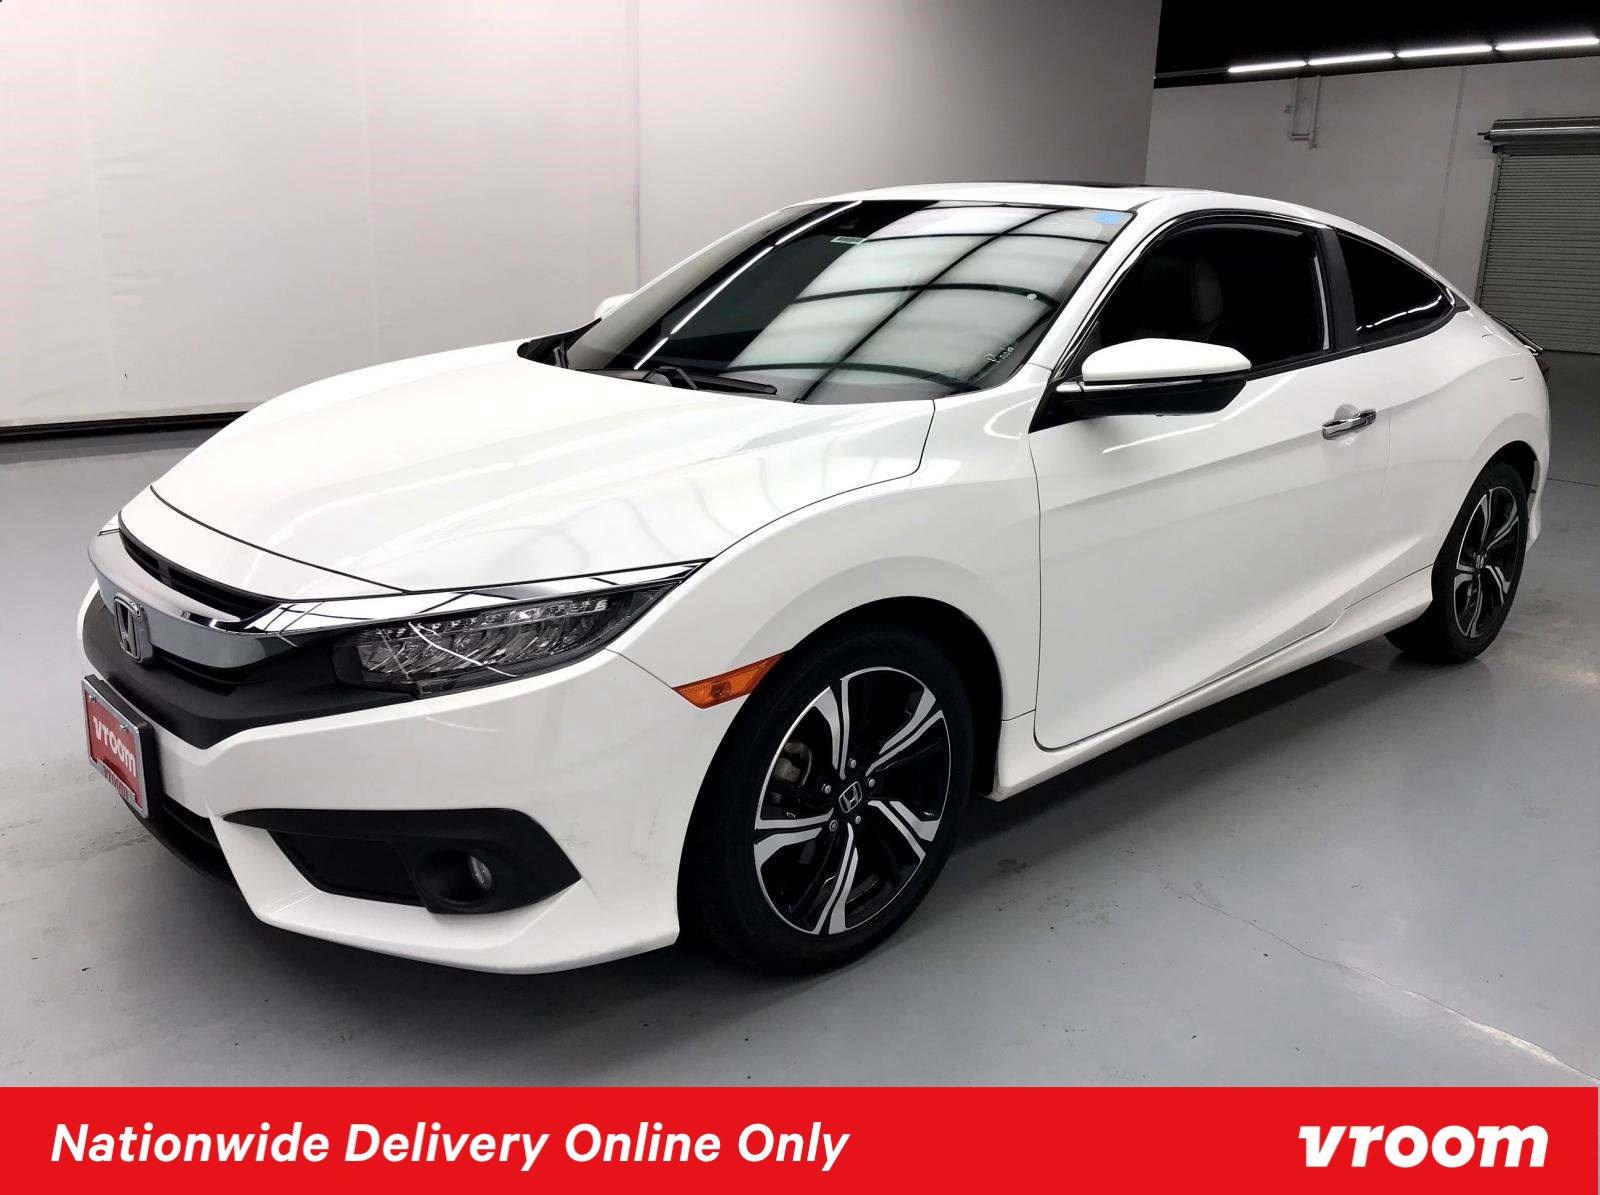 2017 Honda Civic Touring Coupe image